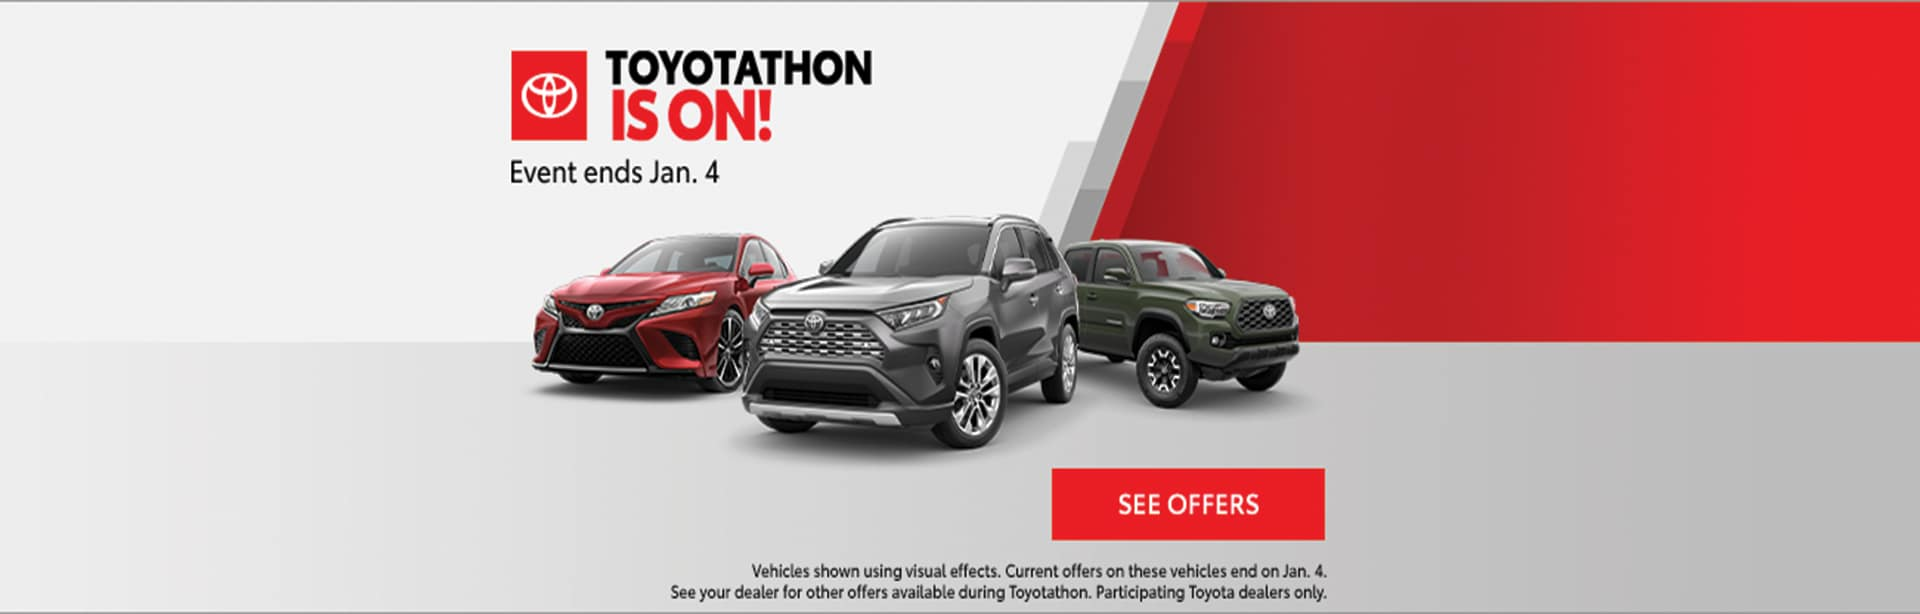 ToyotaThon Multi